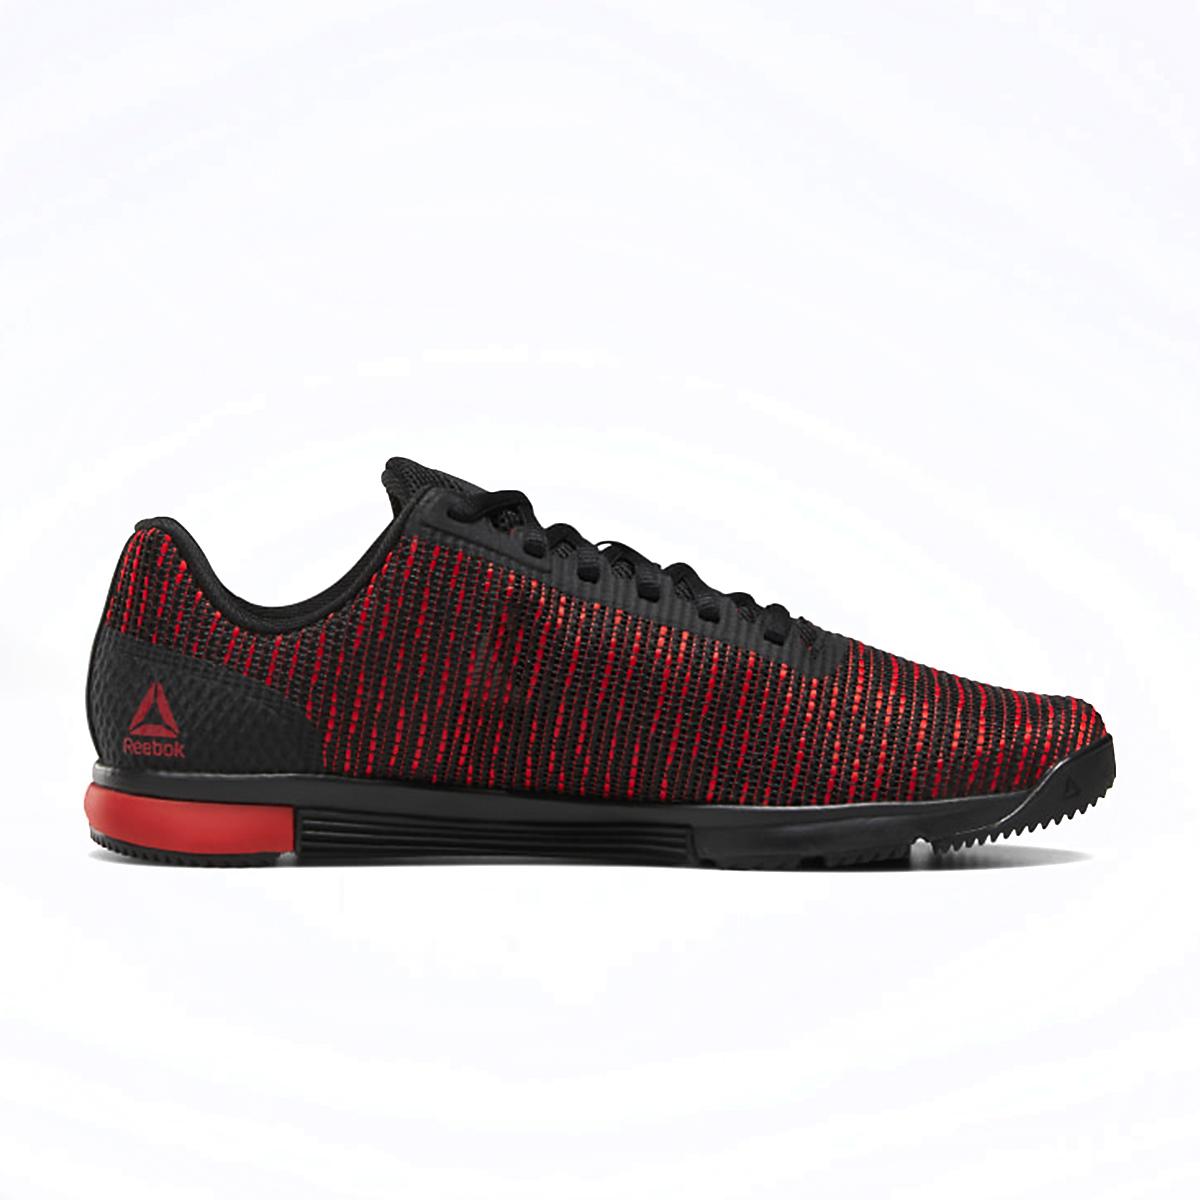 Men's Reebok Speed TR Flexweave Cross Training Shoes - Color: Black/Primal Red/Black - Size: 7 - Width: Regular, Black/Primal Red/Black, large, image 2